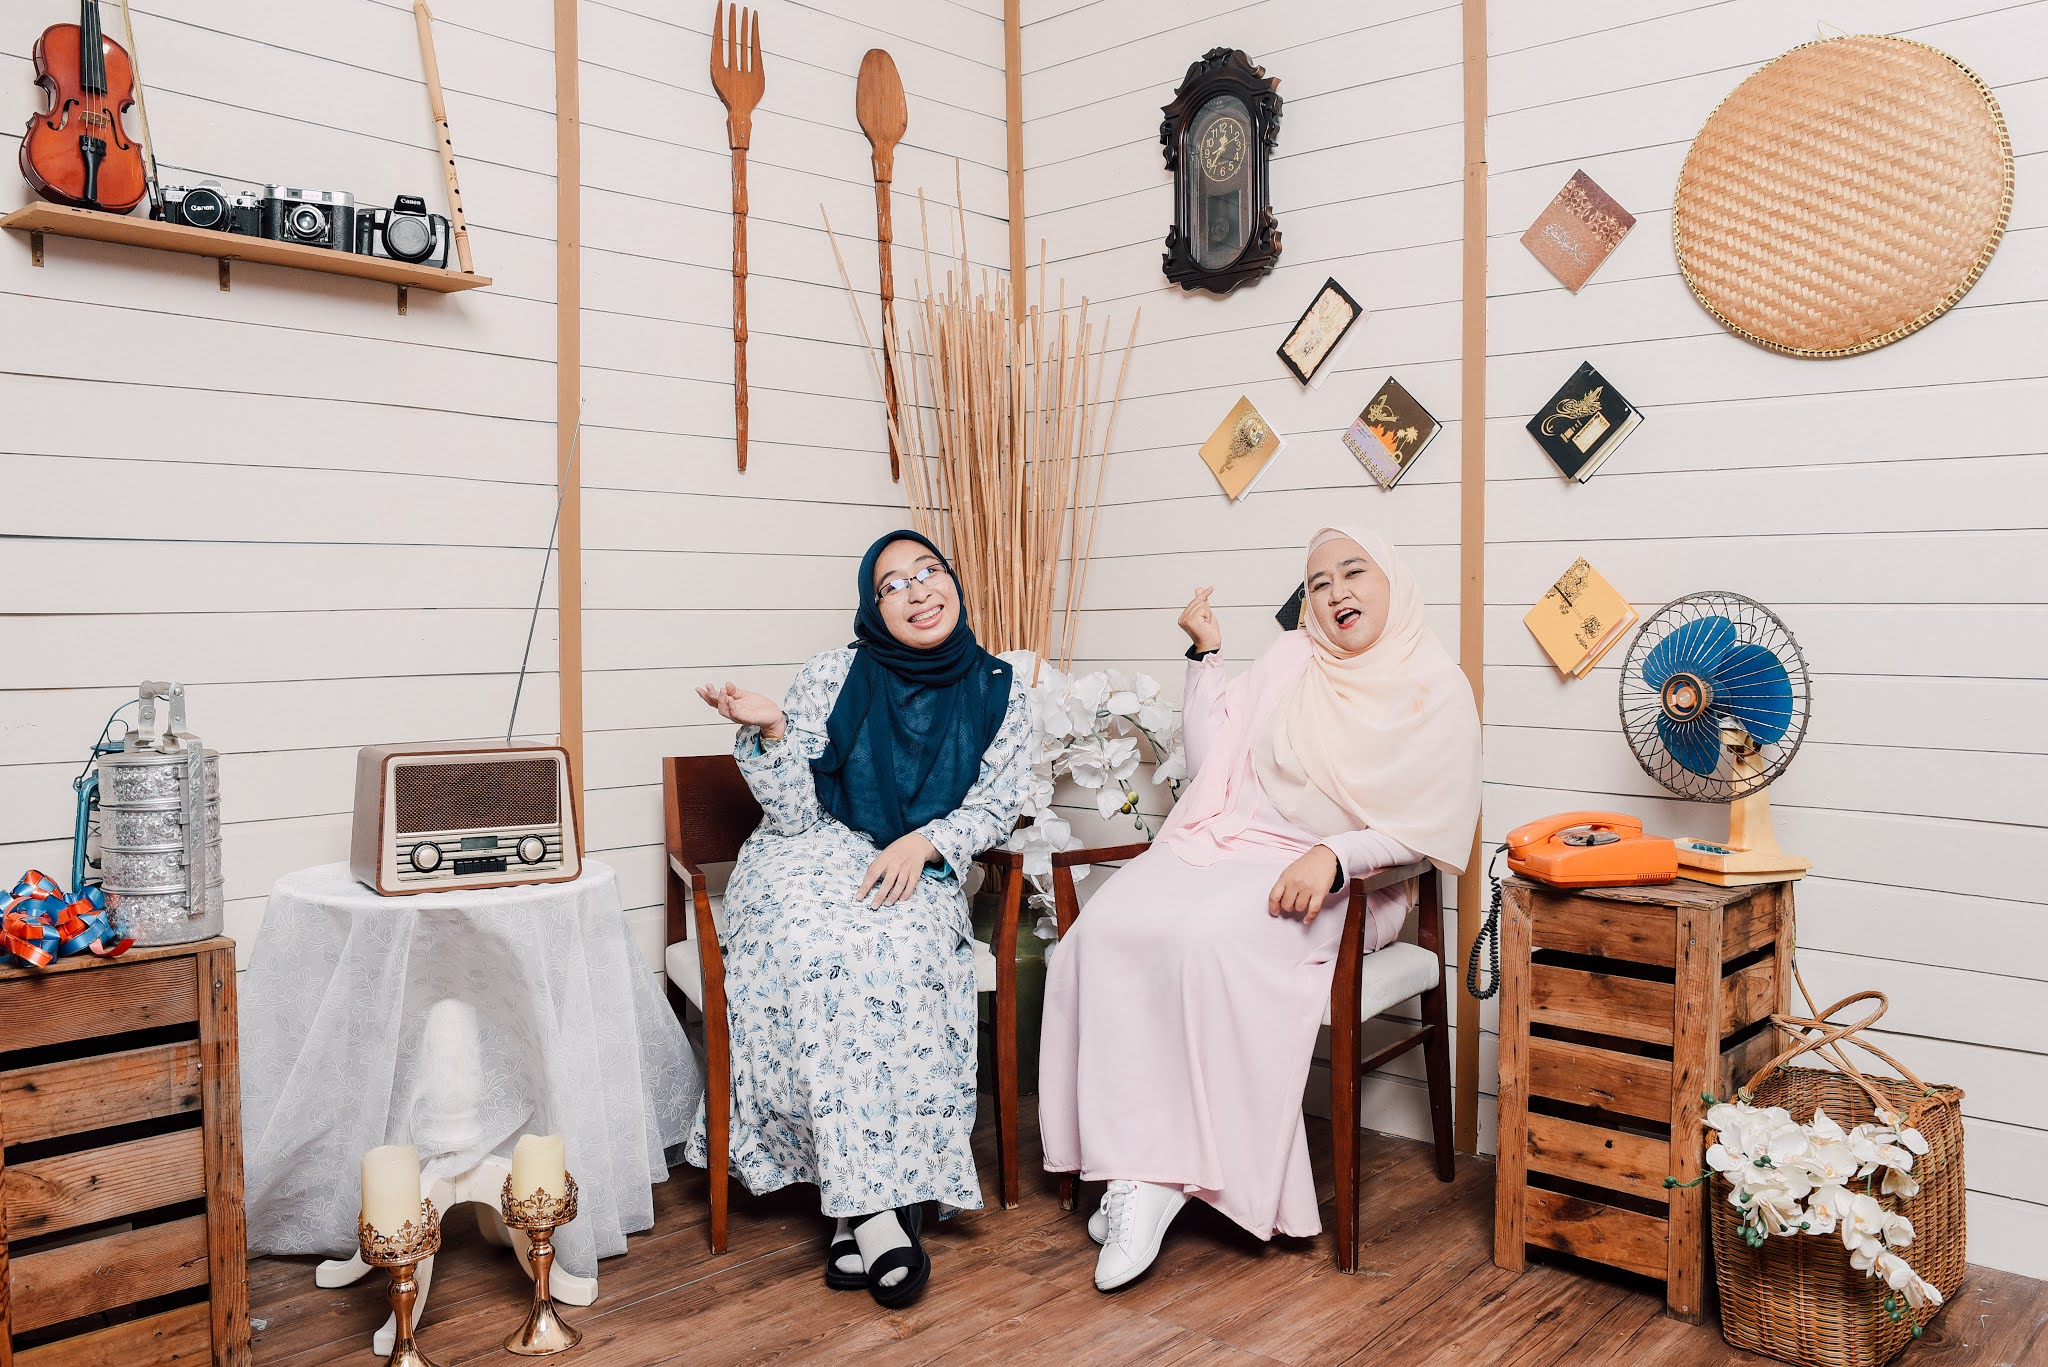 Photoshoot Raya dekat The Empire Studio - byfarahh.com